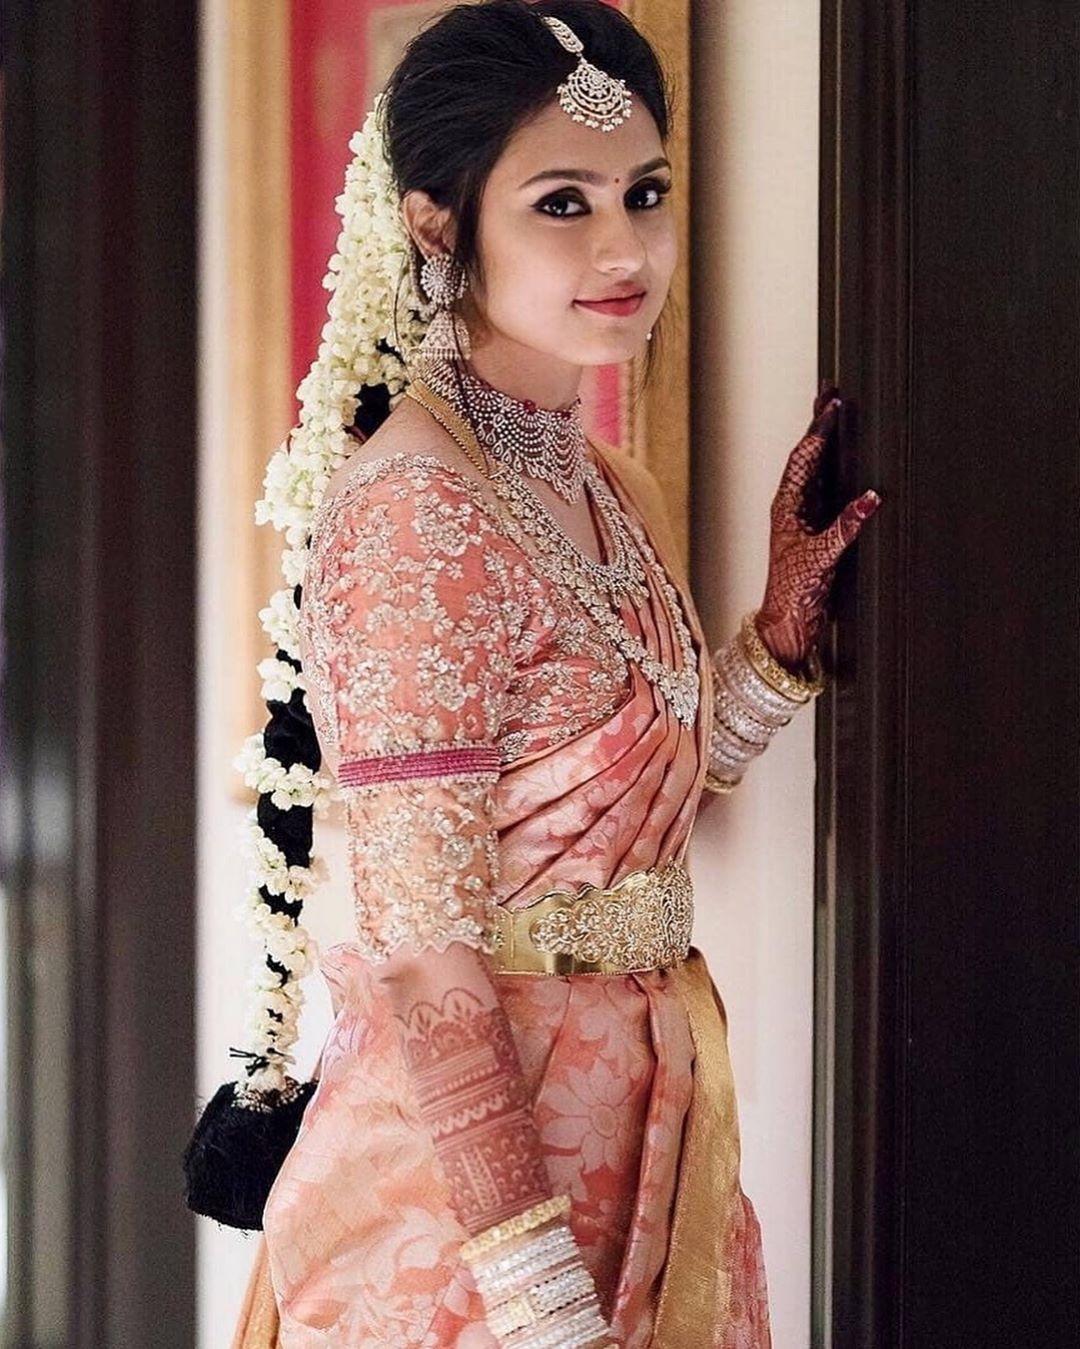 Light pink bridal kanjeevaram saree with embroidered blouse